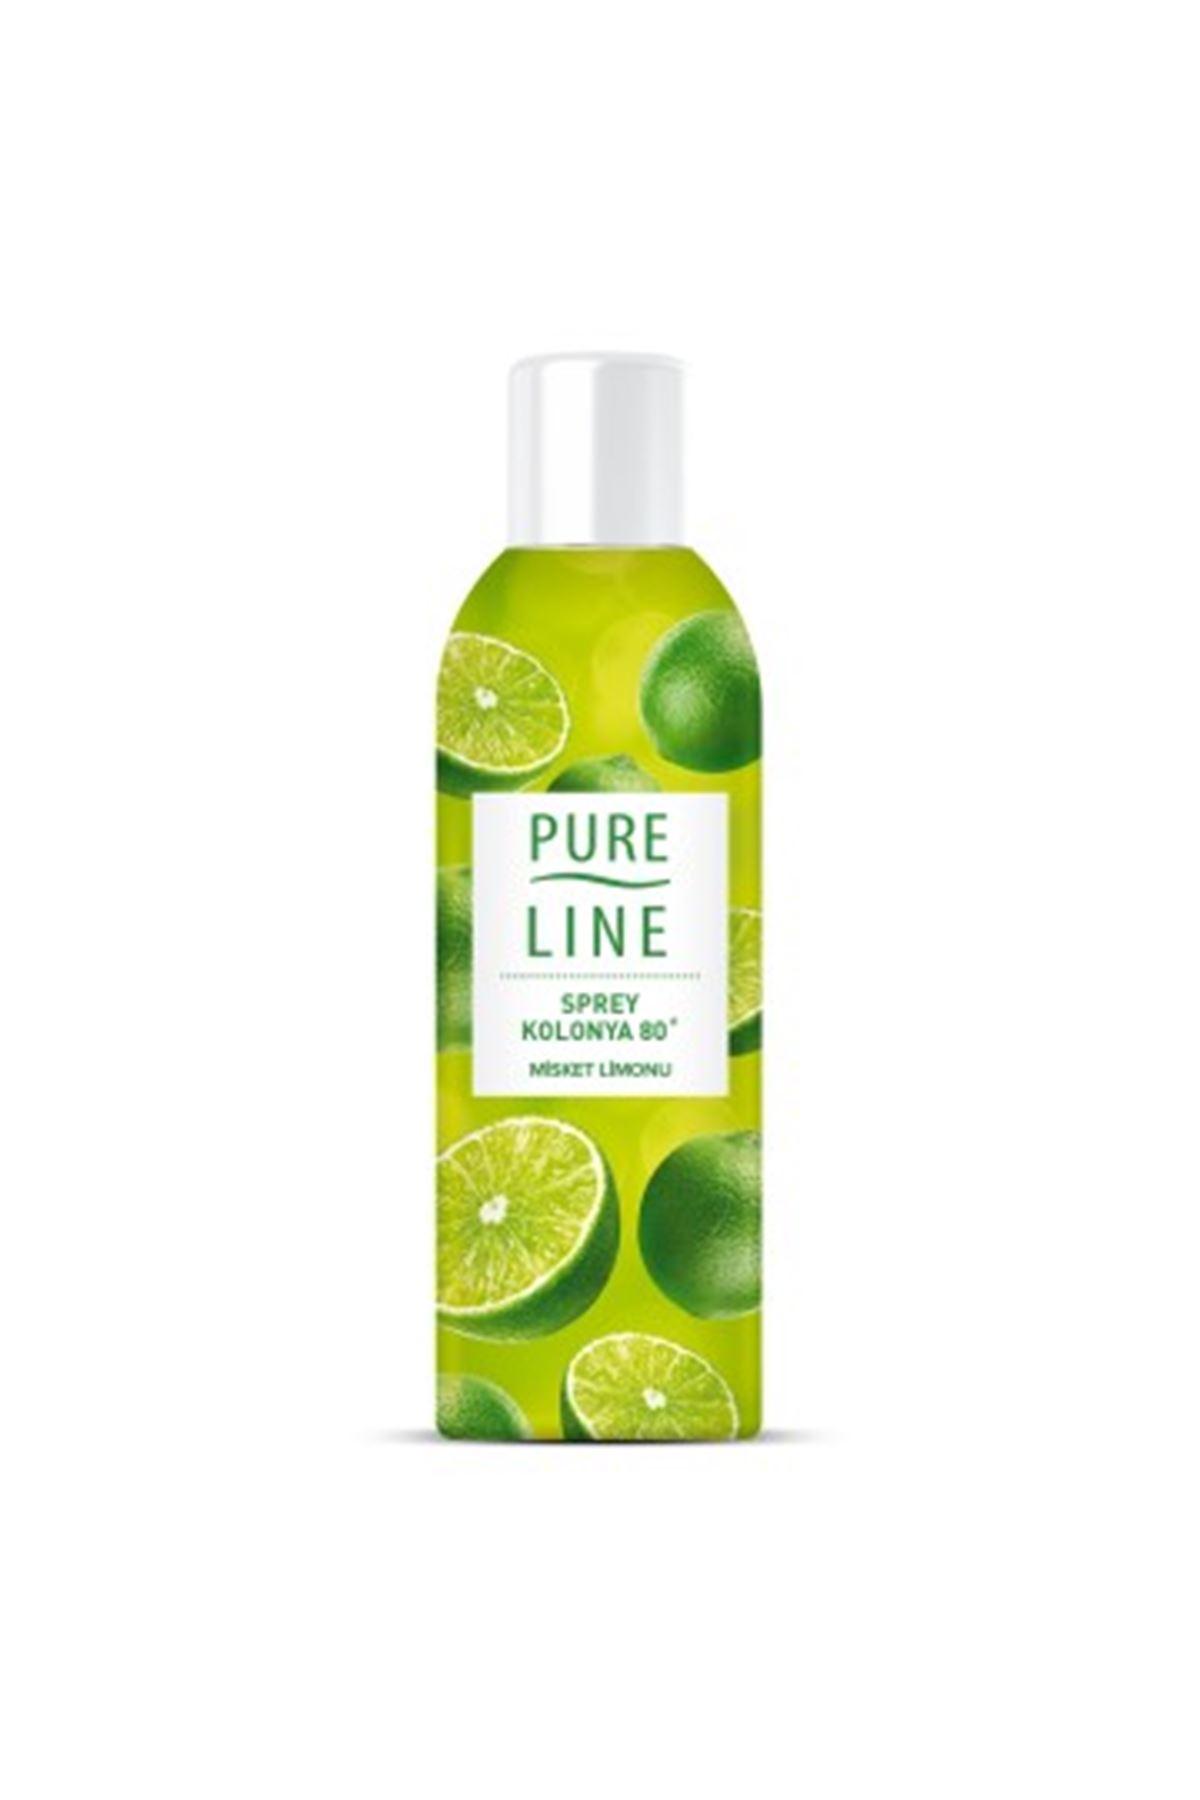 Pure Line Misket Limonu Sprey Kolonya 100 ml